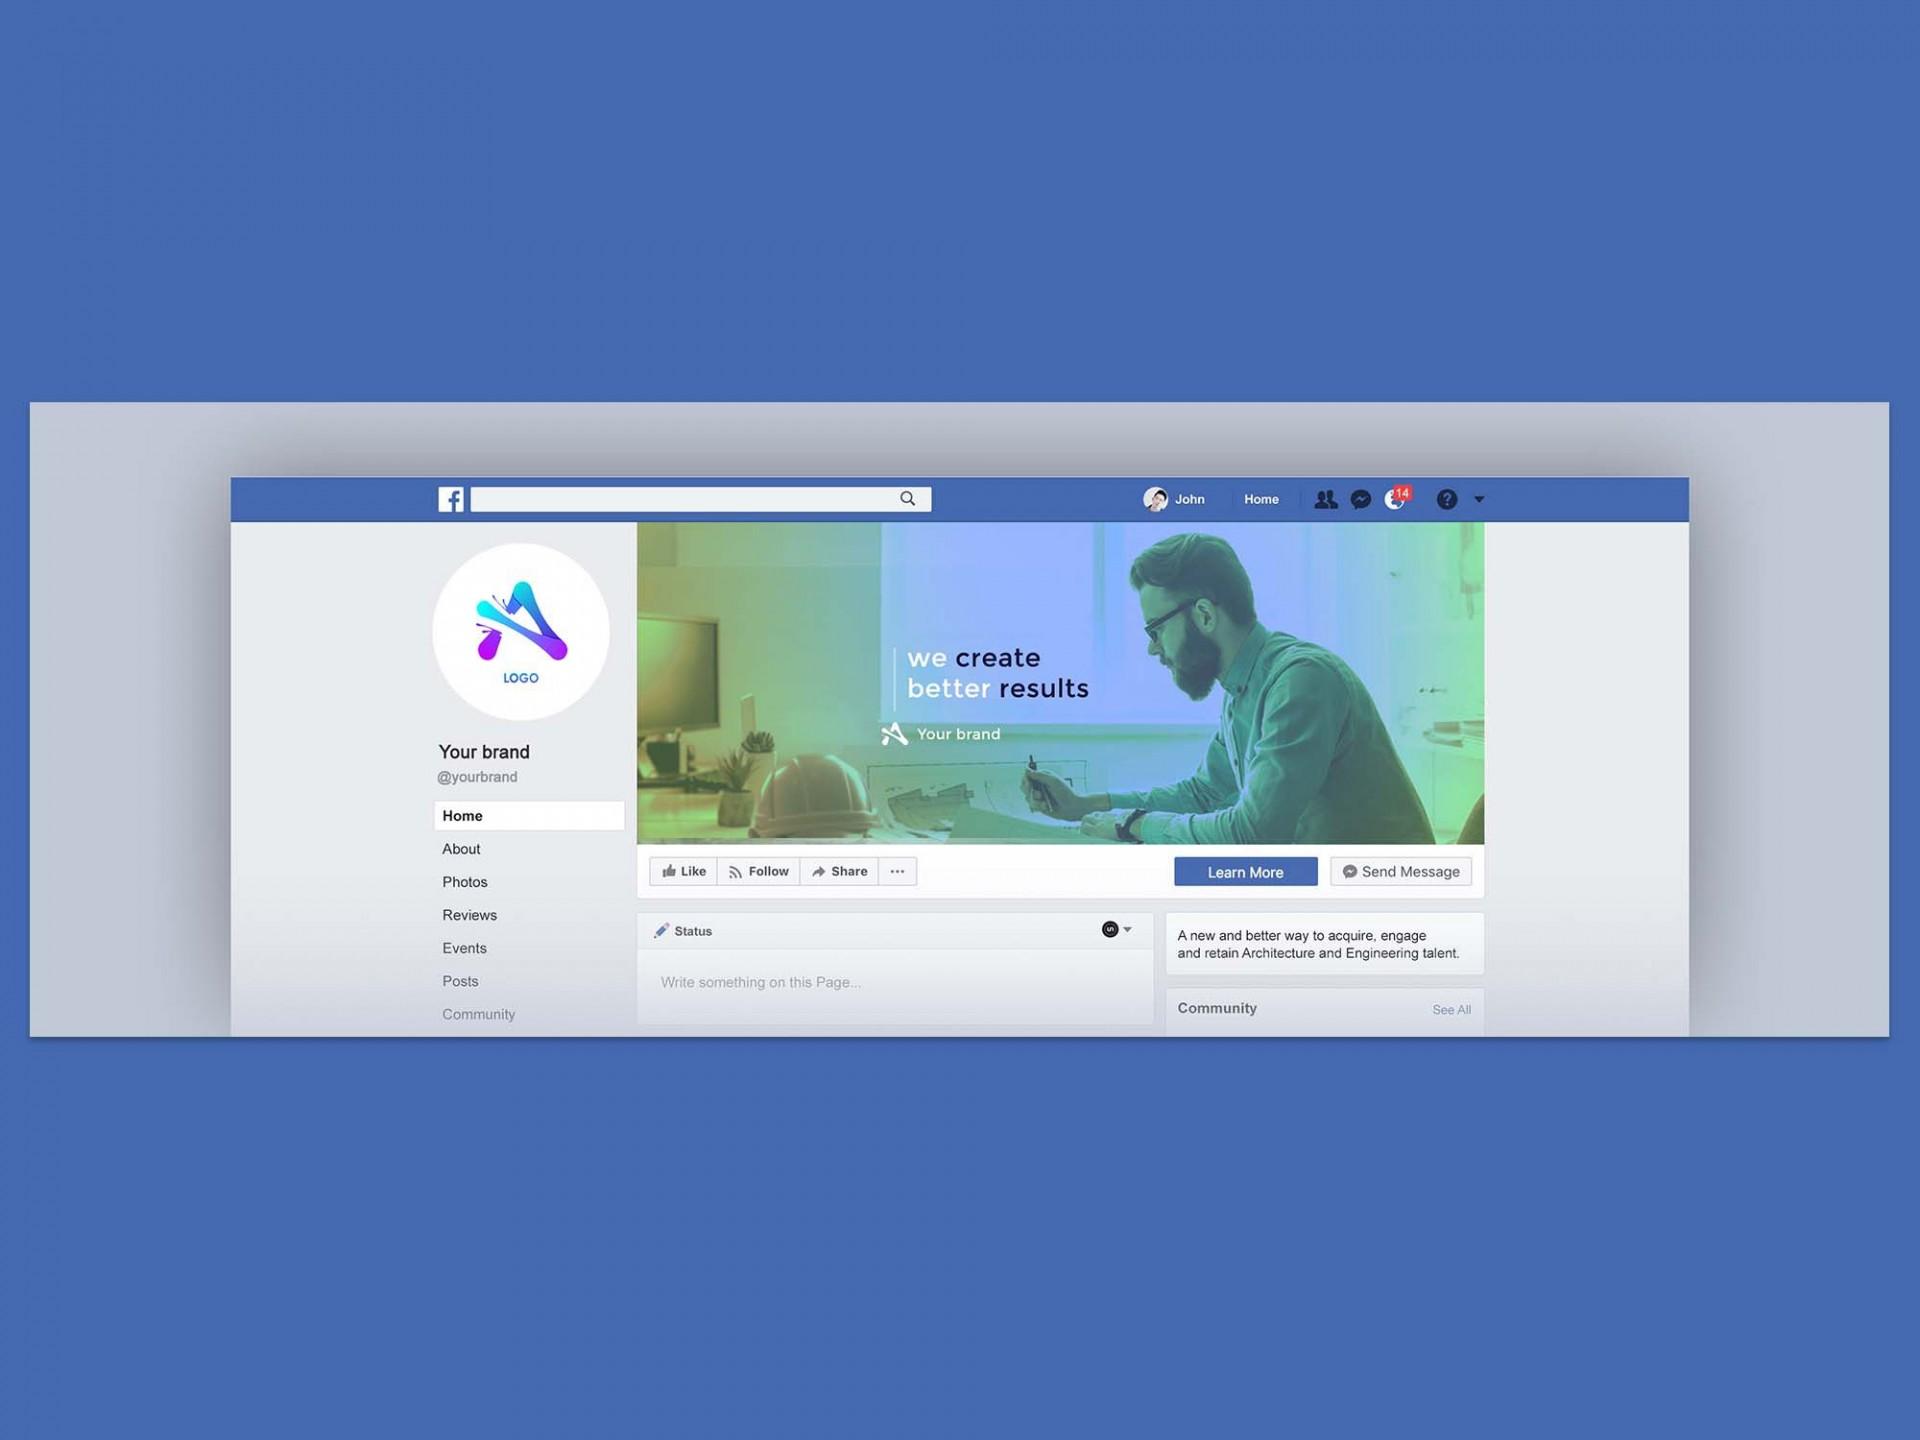 007 Sensational Facebook Cover Photo Photoshop Template Concept  2019 Page Profile Picture Size1920